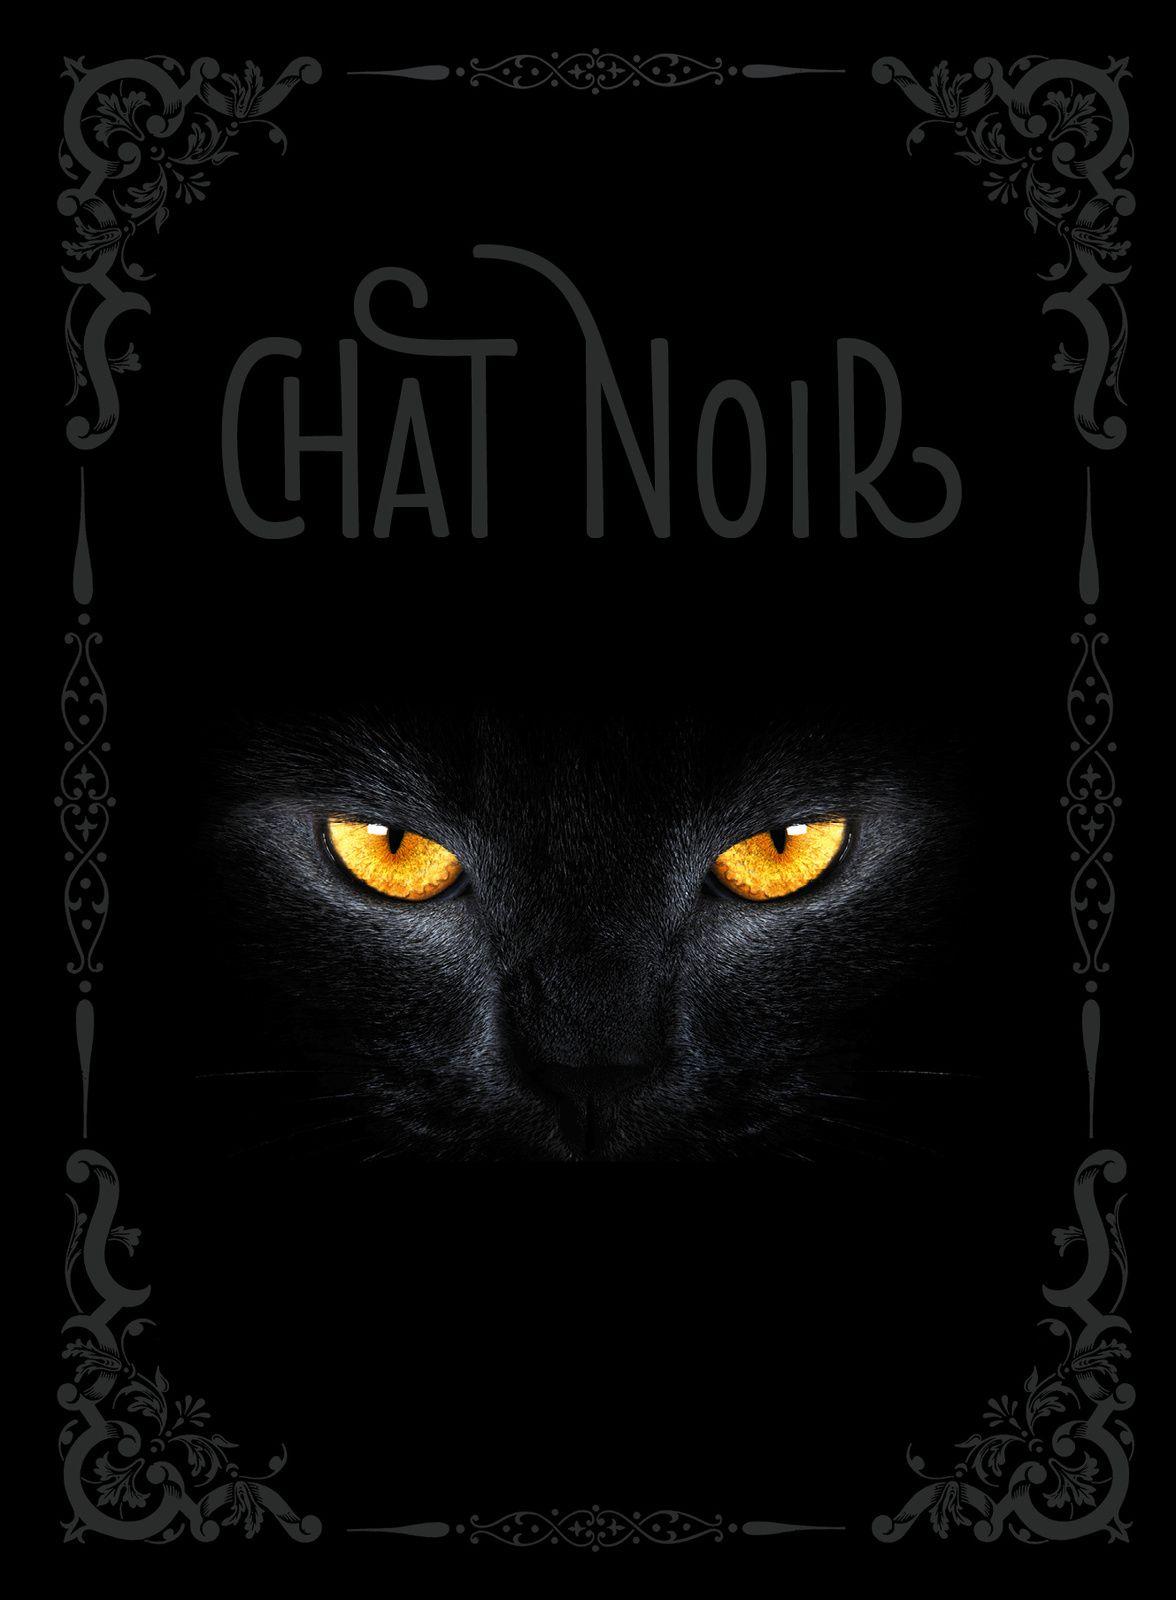 """Chat Noir"" de Nathalie  Semenuik"